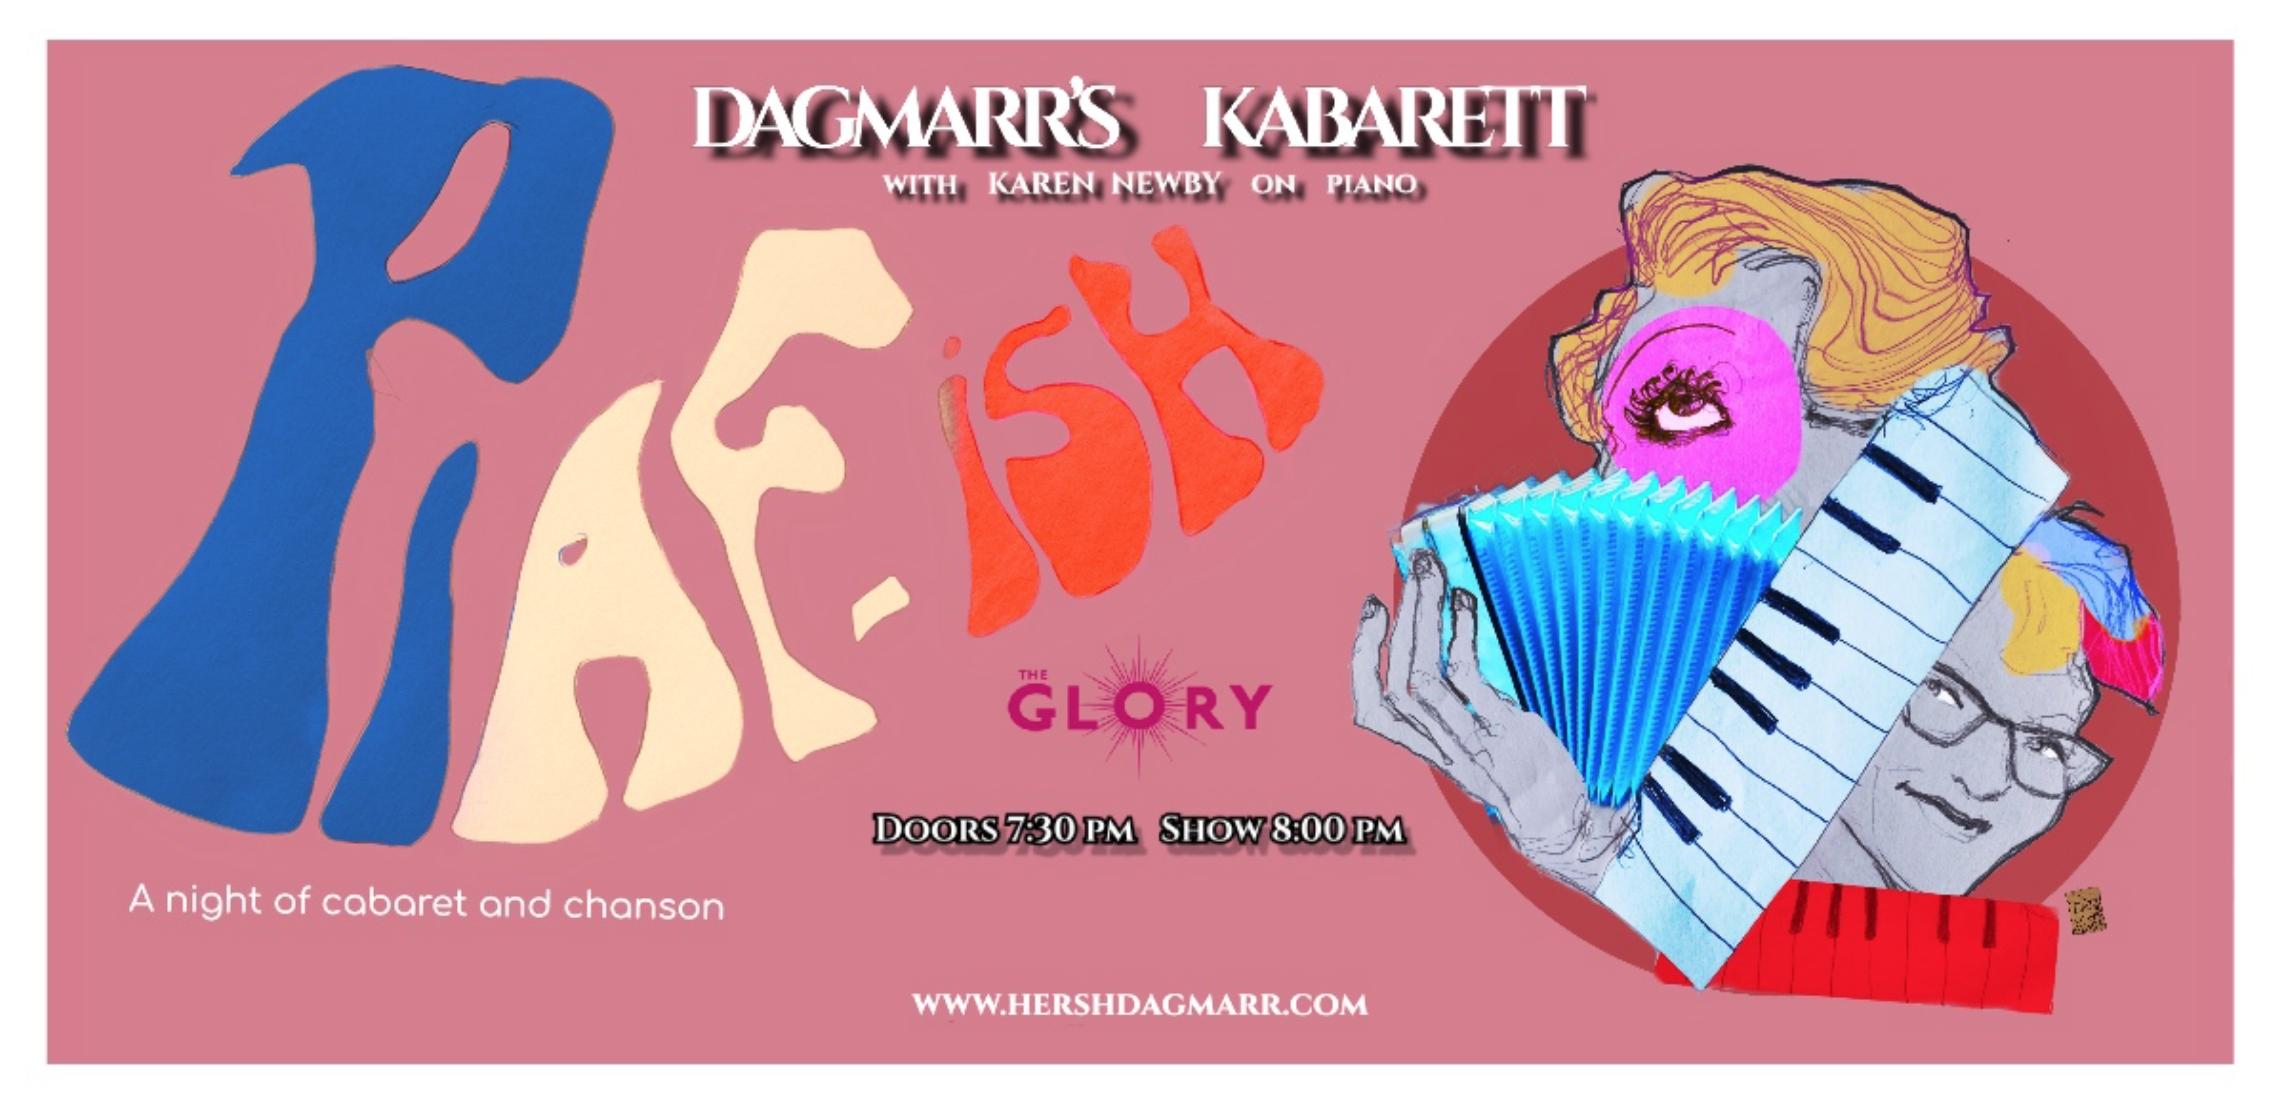 Dagmarr's Kabarett – 'Piaf-ish'